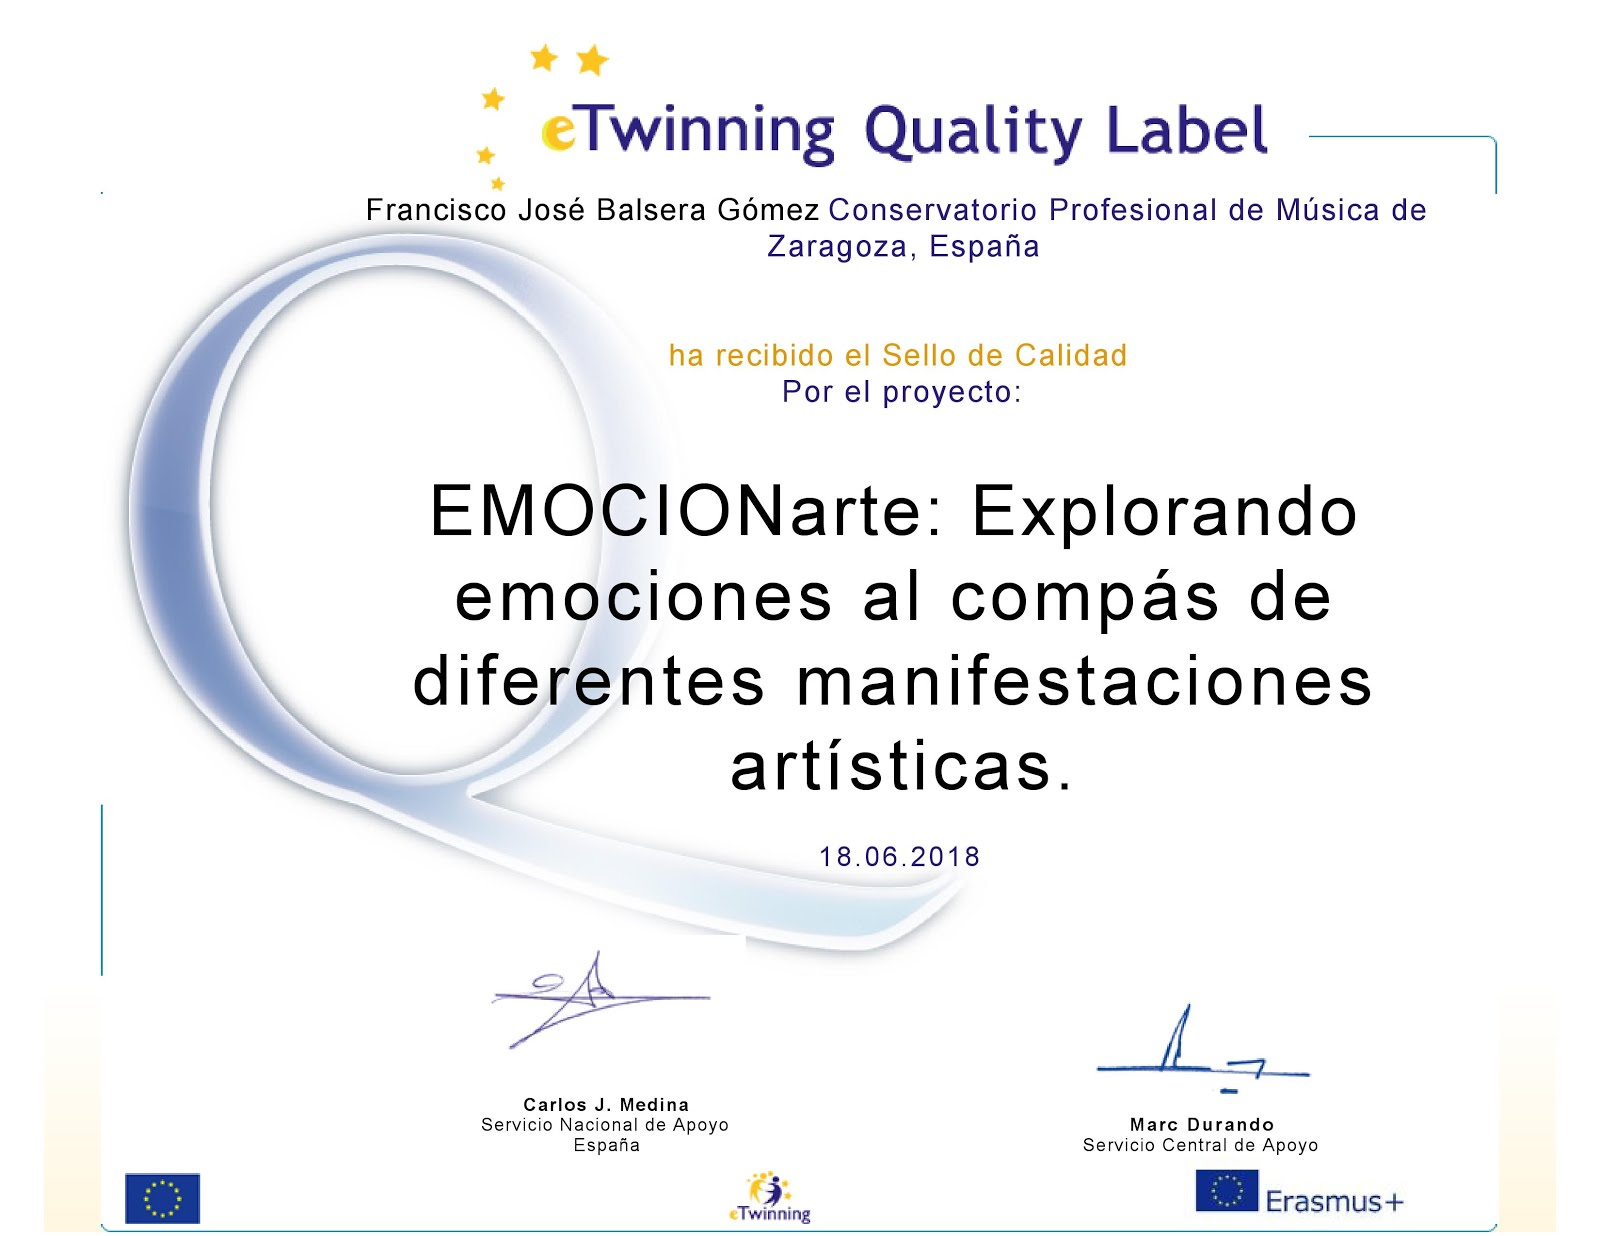 Sello de calidad eTwinning 2018